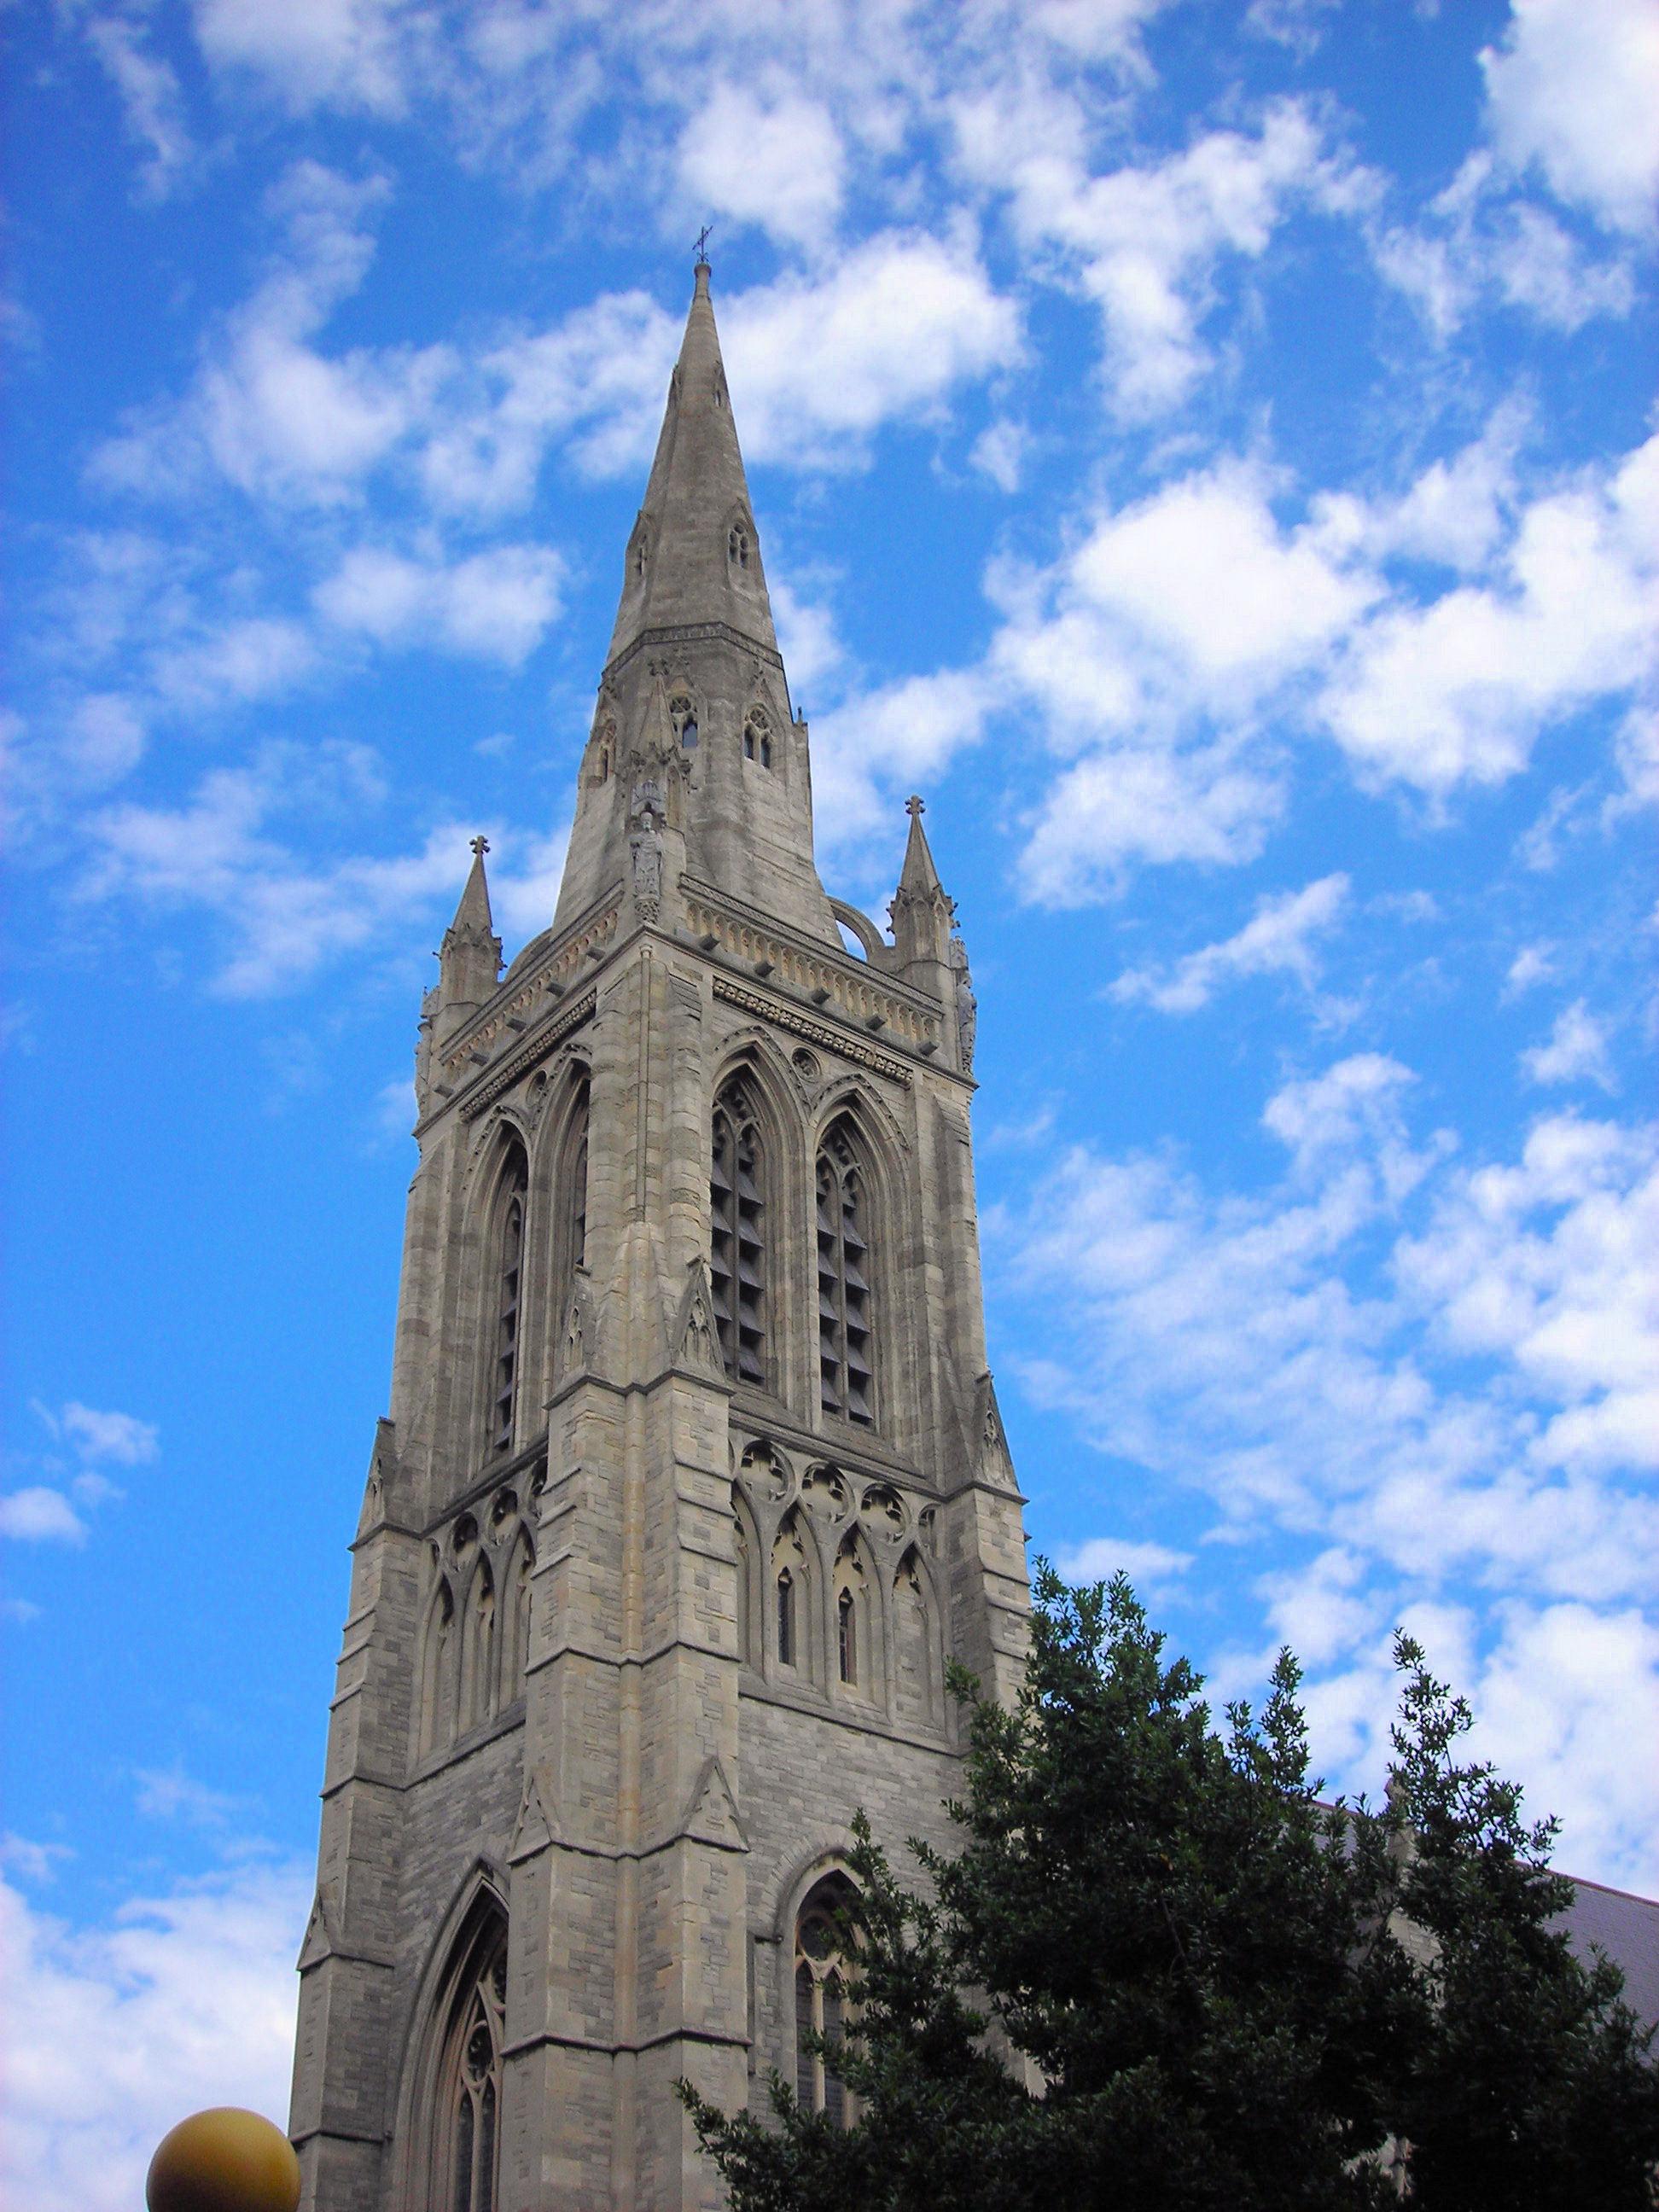 FileSaint Peters Church  Bournemouth Dorset Englandjpg  Wikimedia Commons